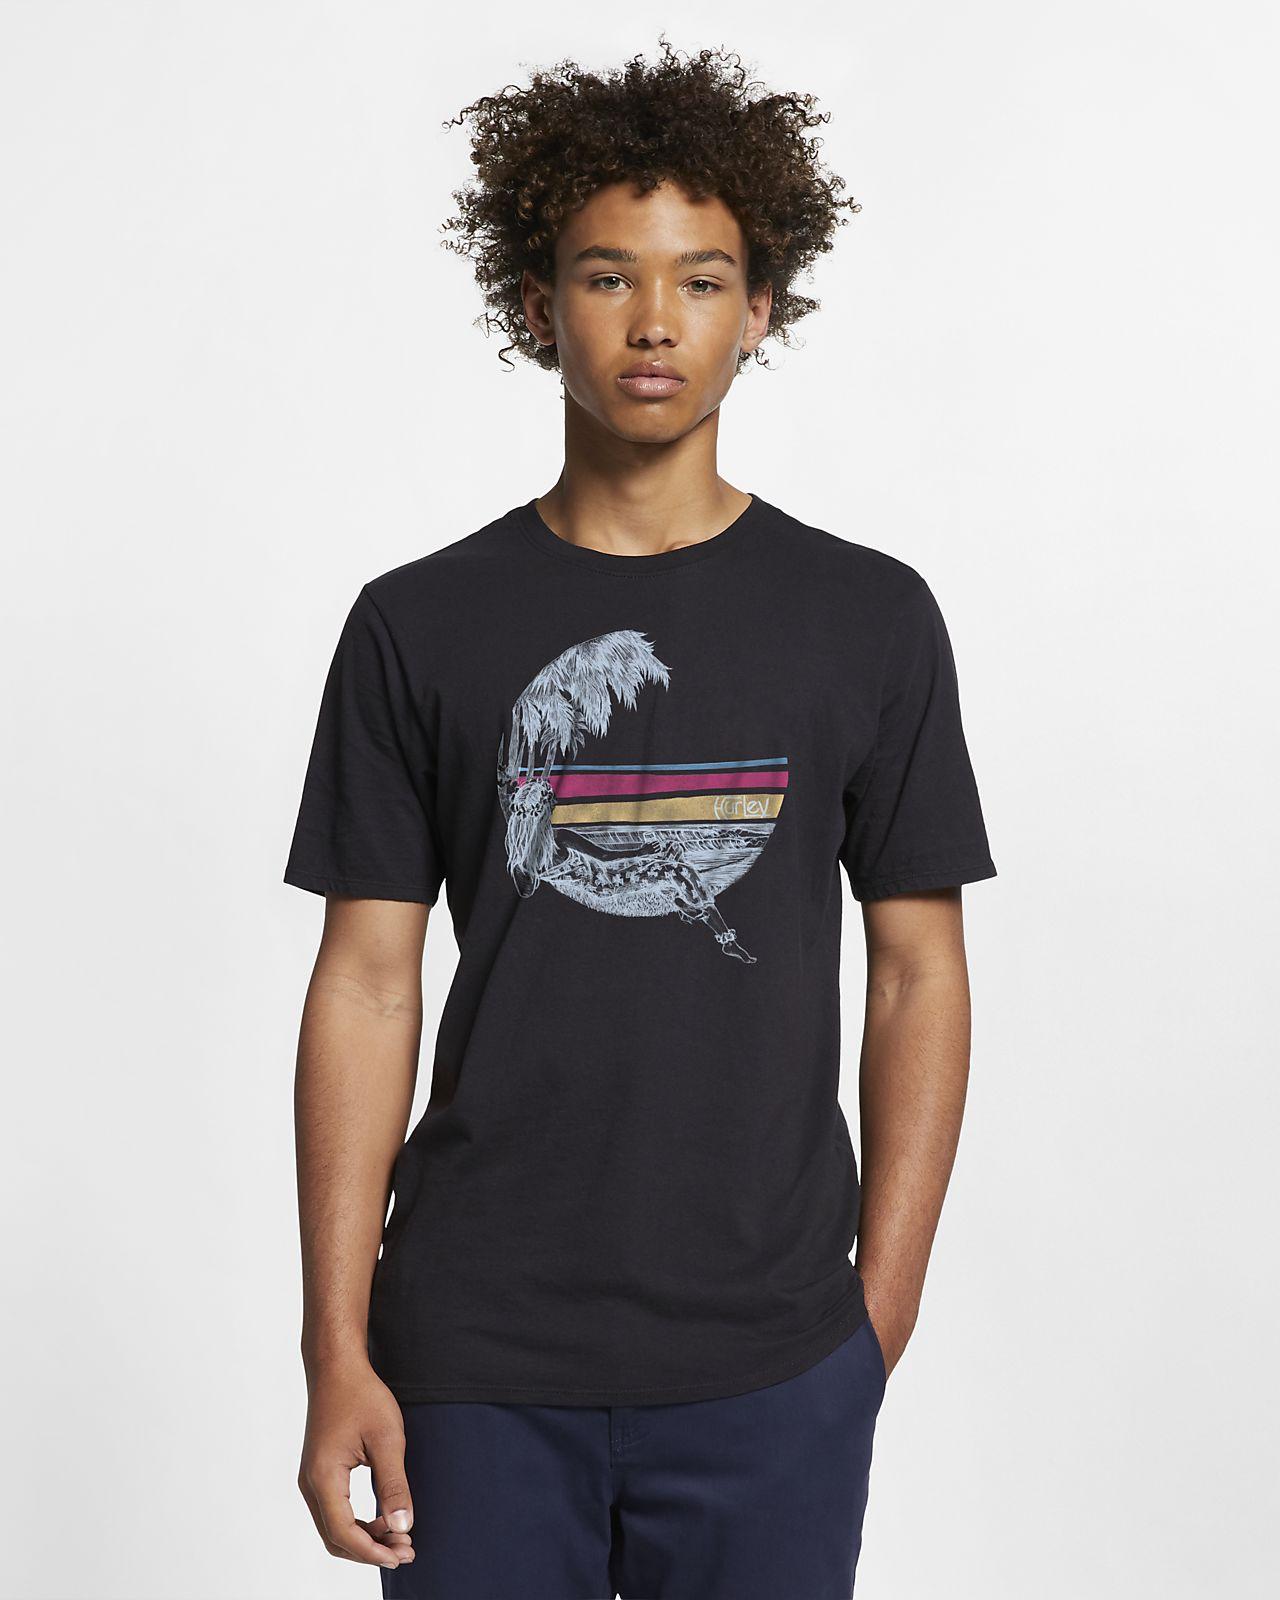 Hurley Lost in Bali Men's T-Shirt